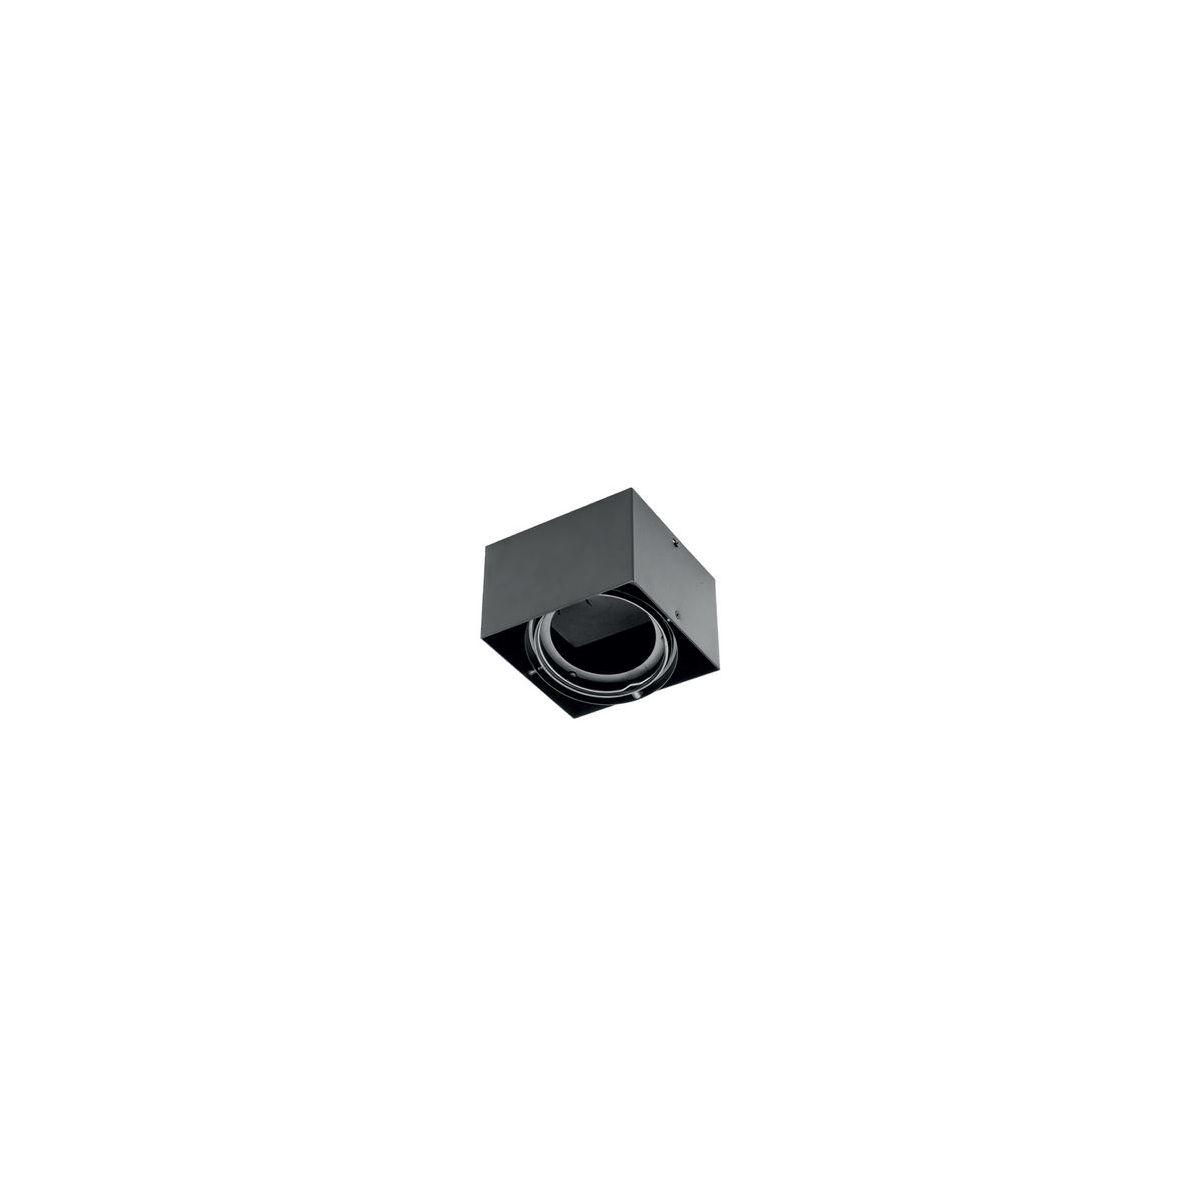 Oprawa Natynkowa Pireo N 1 Czarna Op Piren1 20